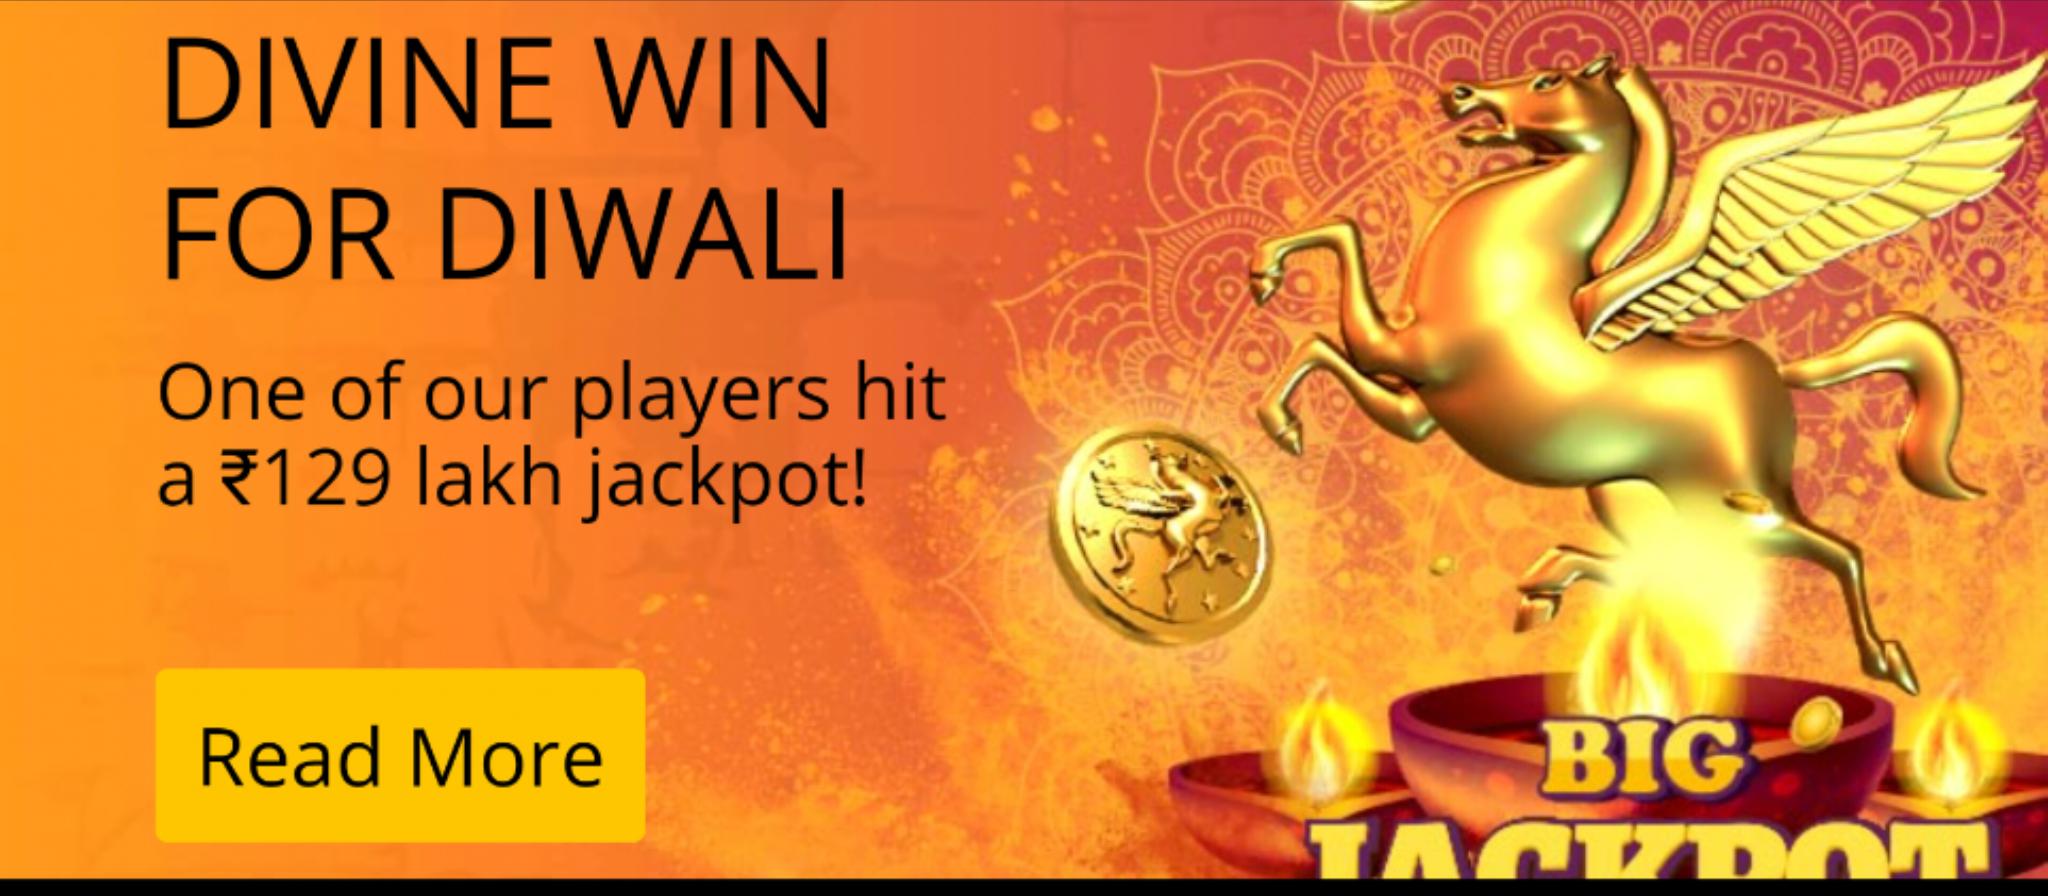 10Cric Player Won 1.29 Crore on Diwali!